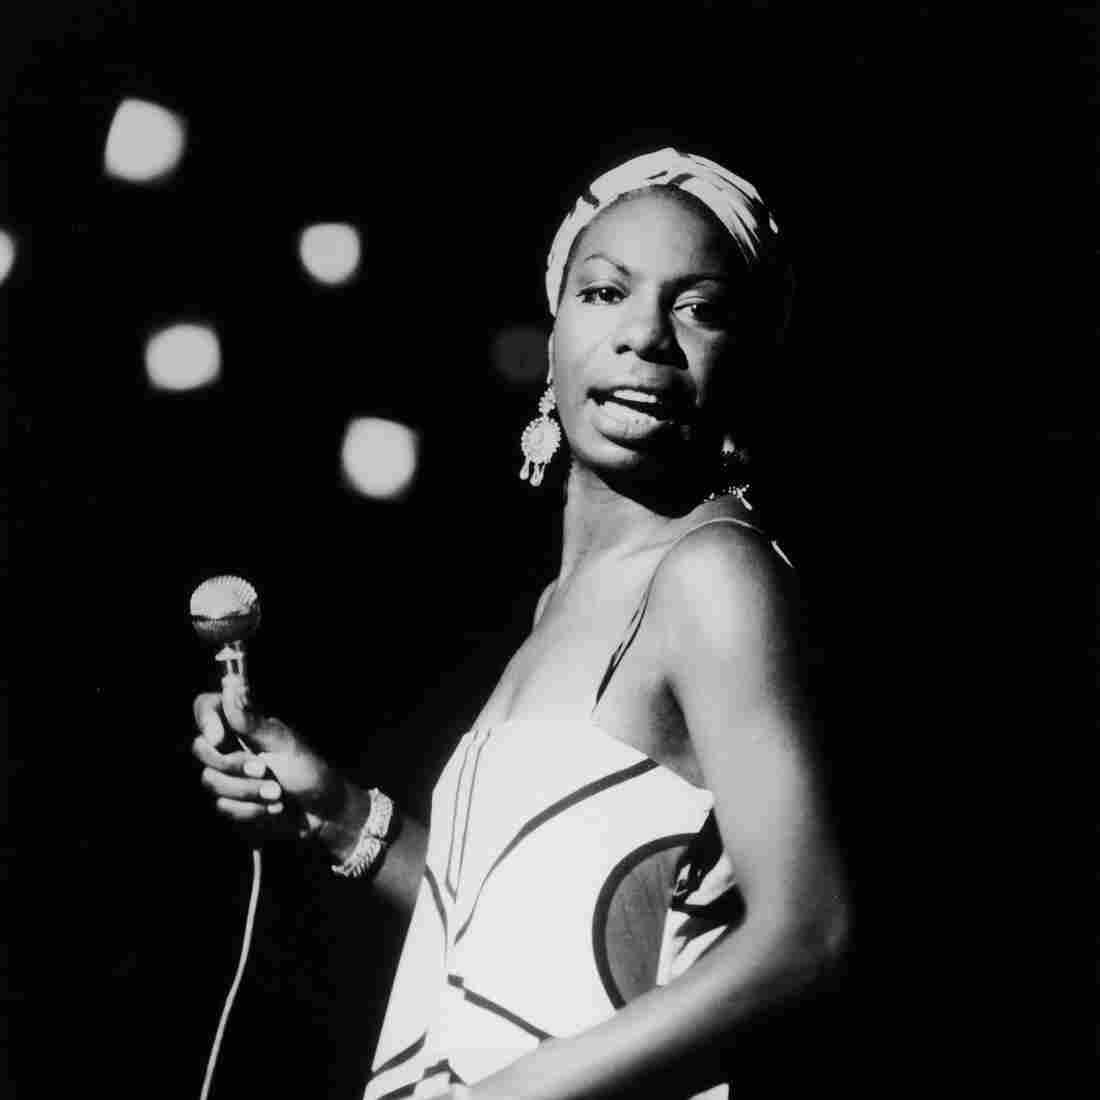 The High Priestess Of Soul: Nina Simone In 5 Songs